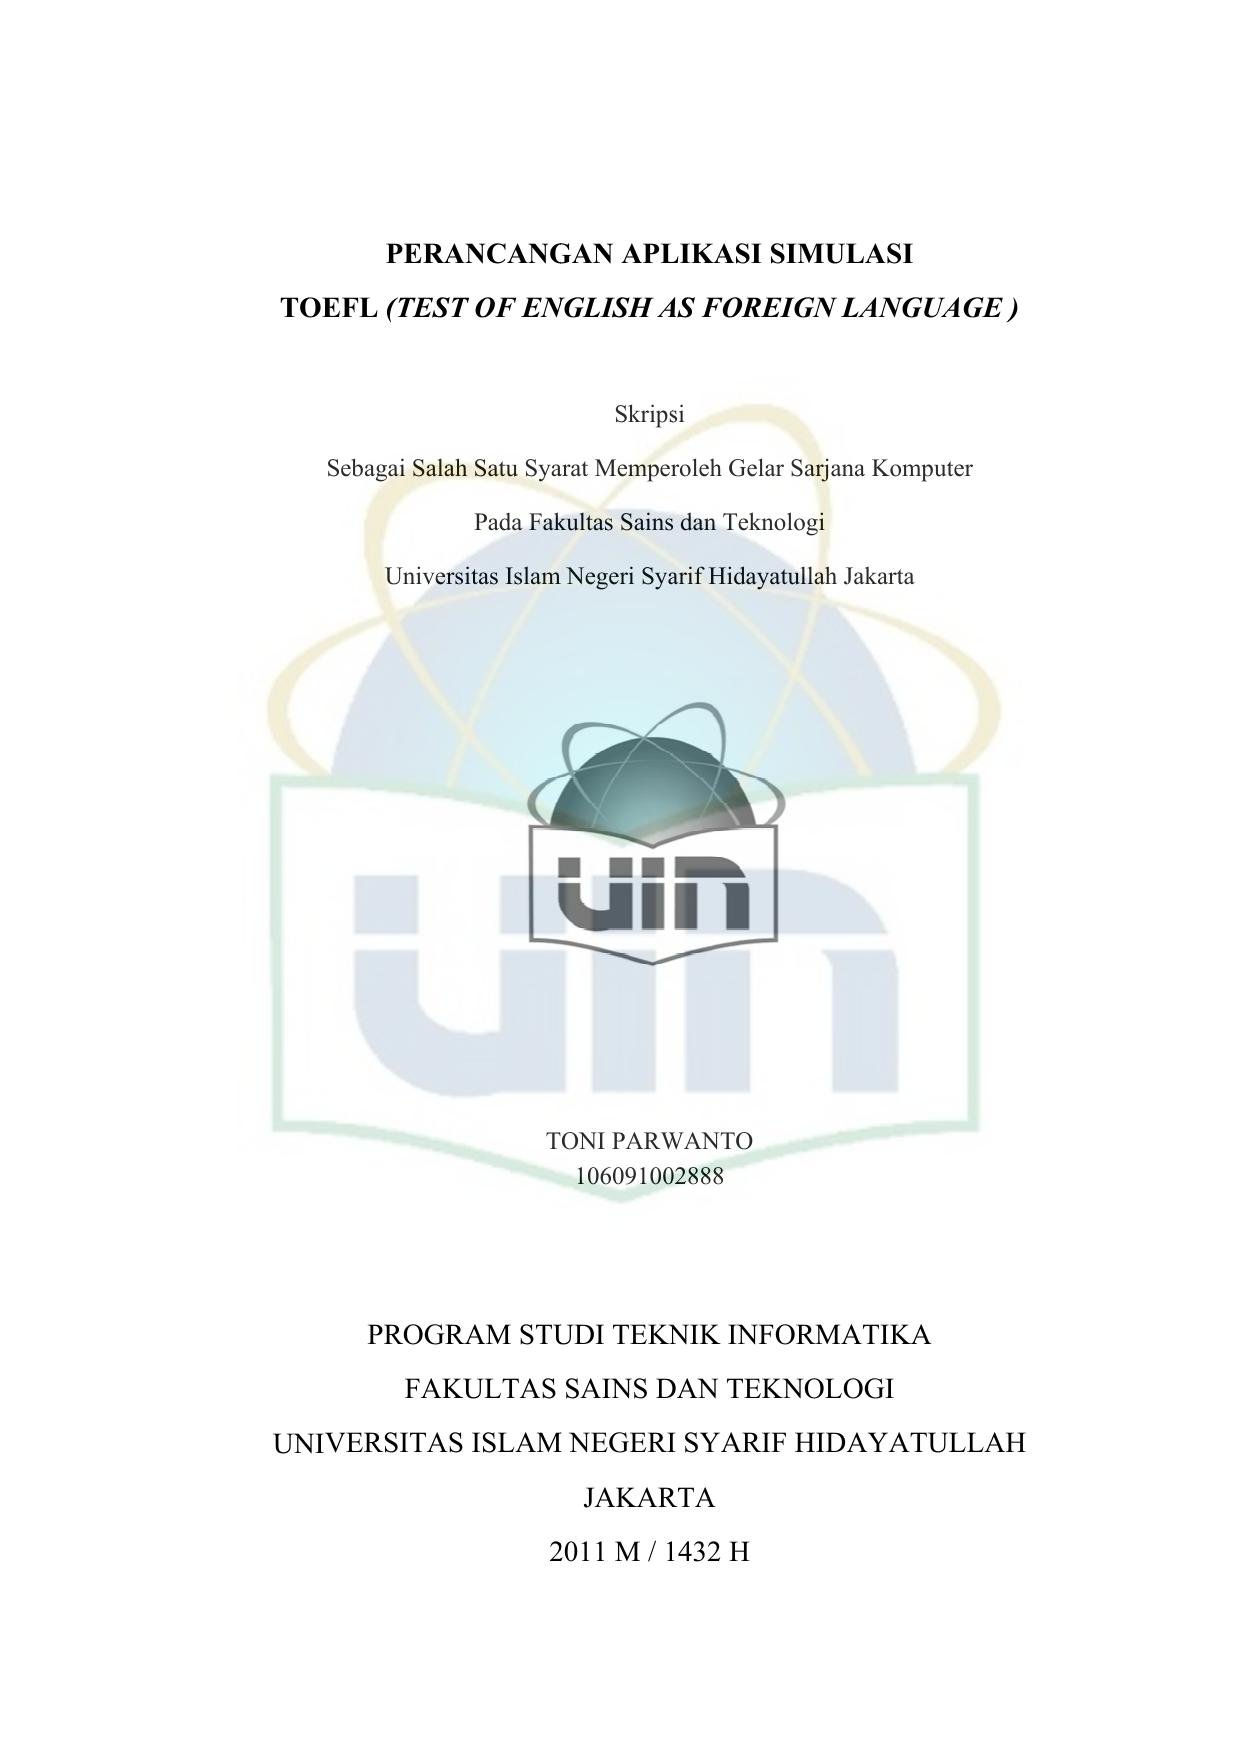 Perancangan Aplikasi Simulasi Toefl Uin Repository